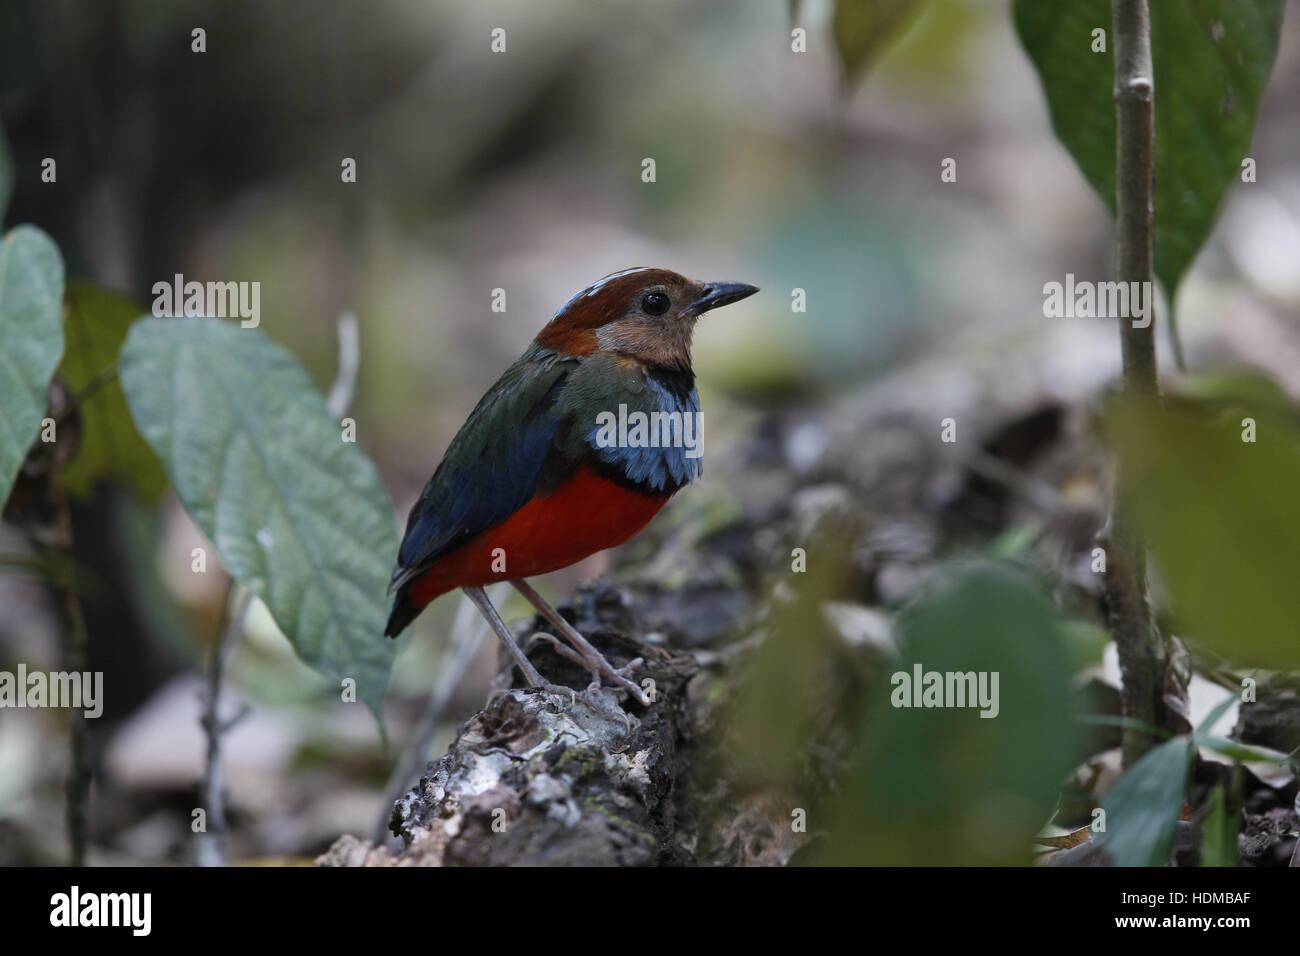 Sulawesi Pitta, Erythropitta (Pitta) celebensis - Stock Image